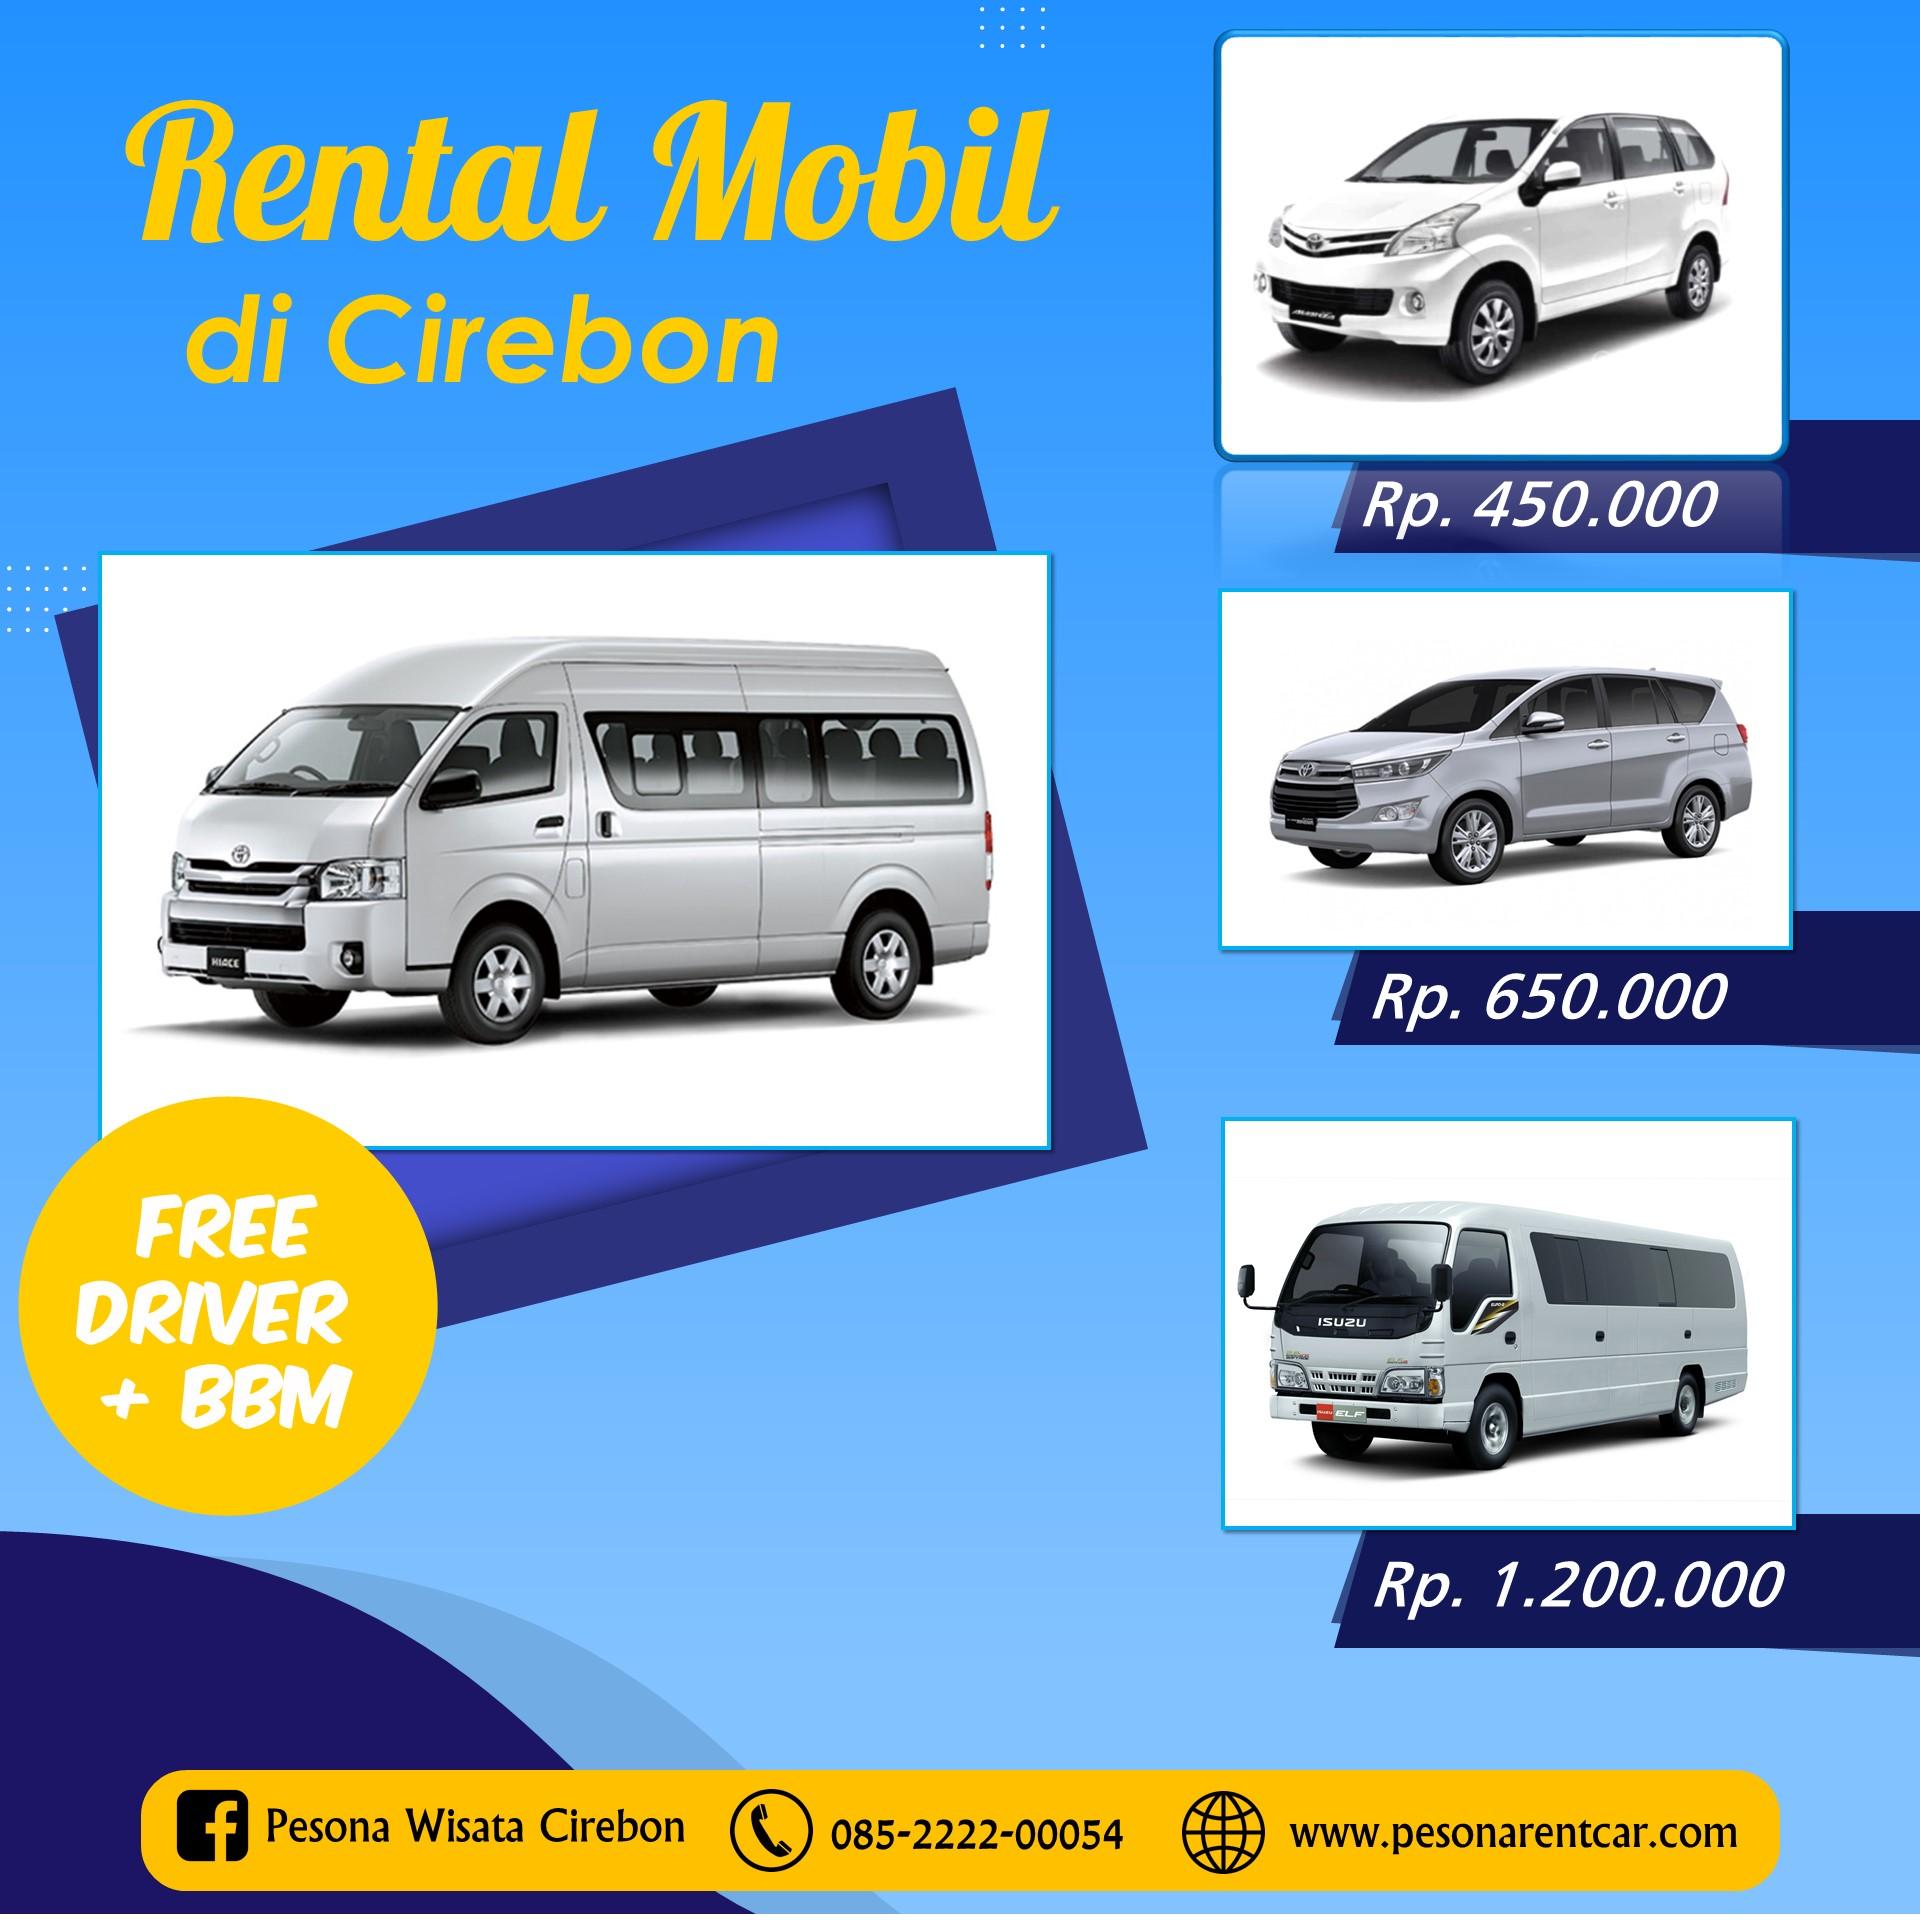 Harga Rental Mobil Di Cirebon Pesona Rent Car Cv Pesona Wisata